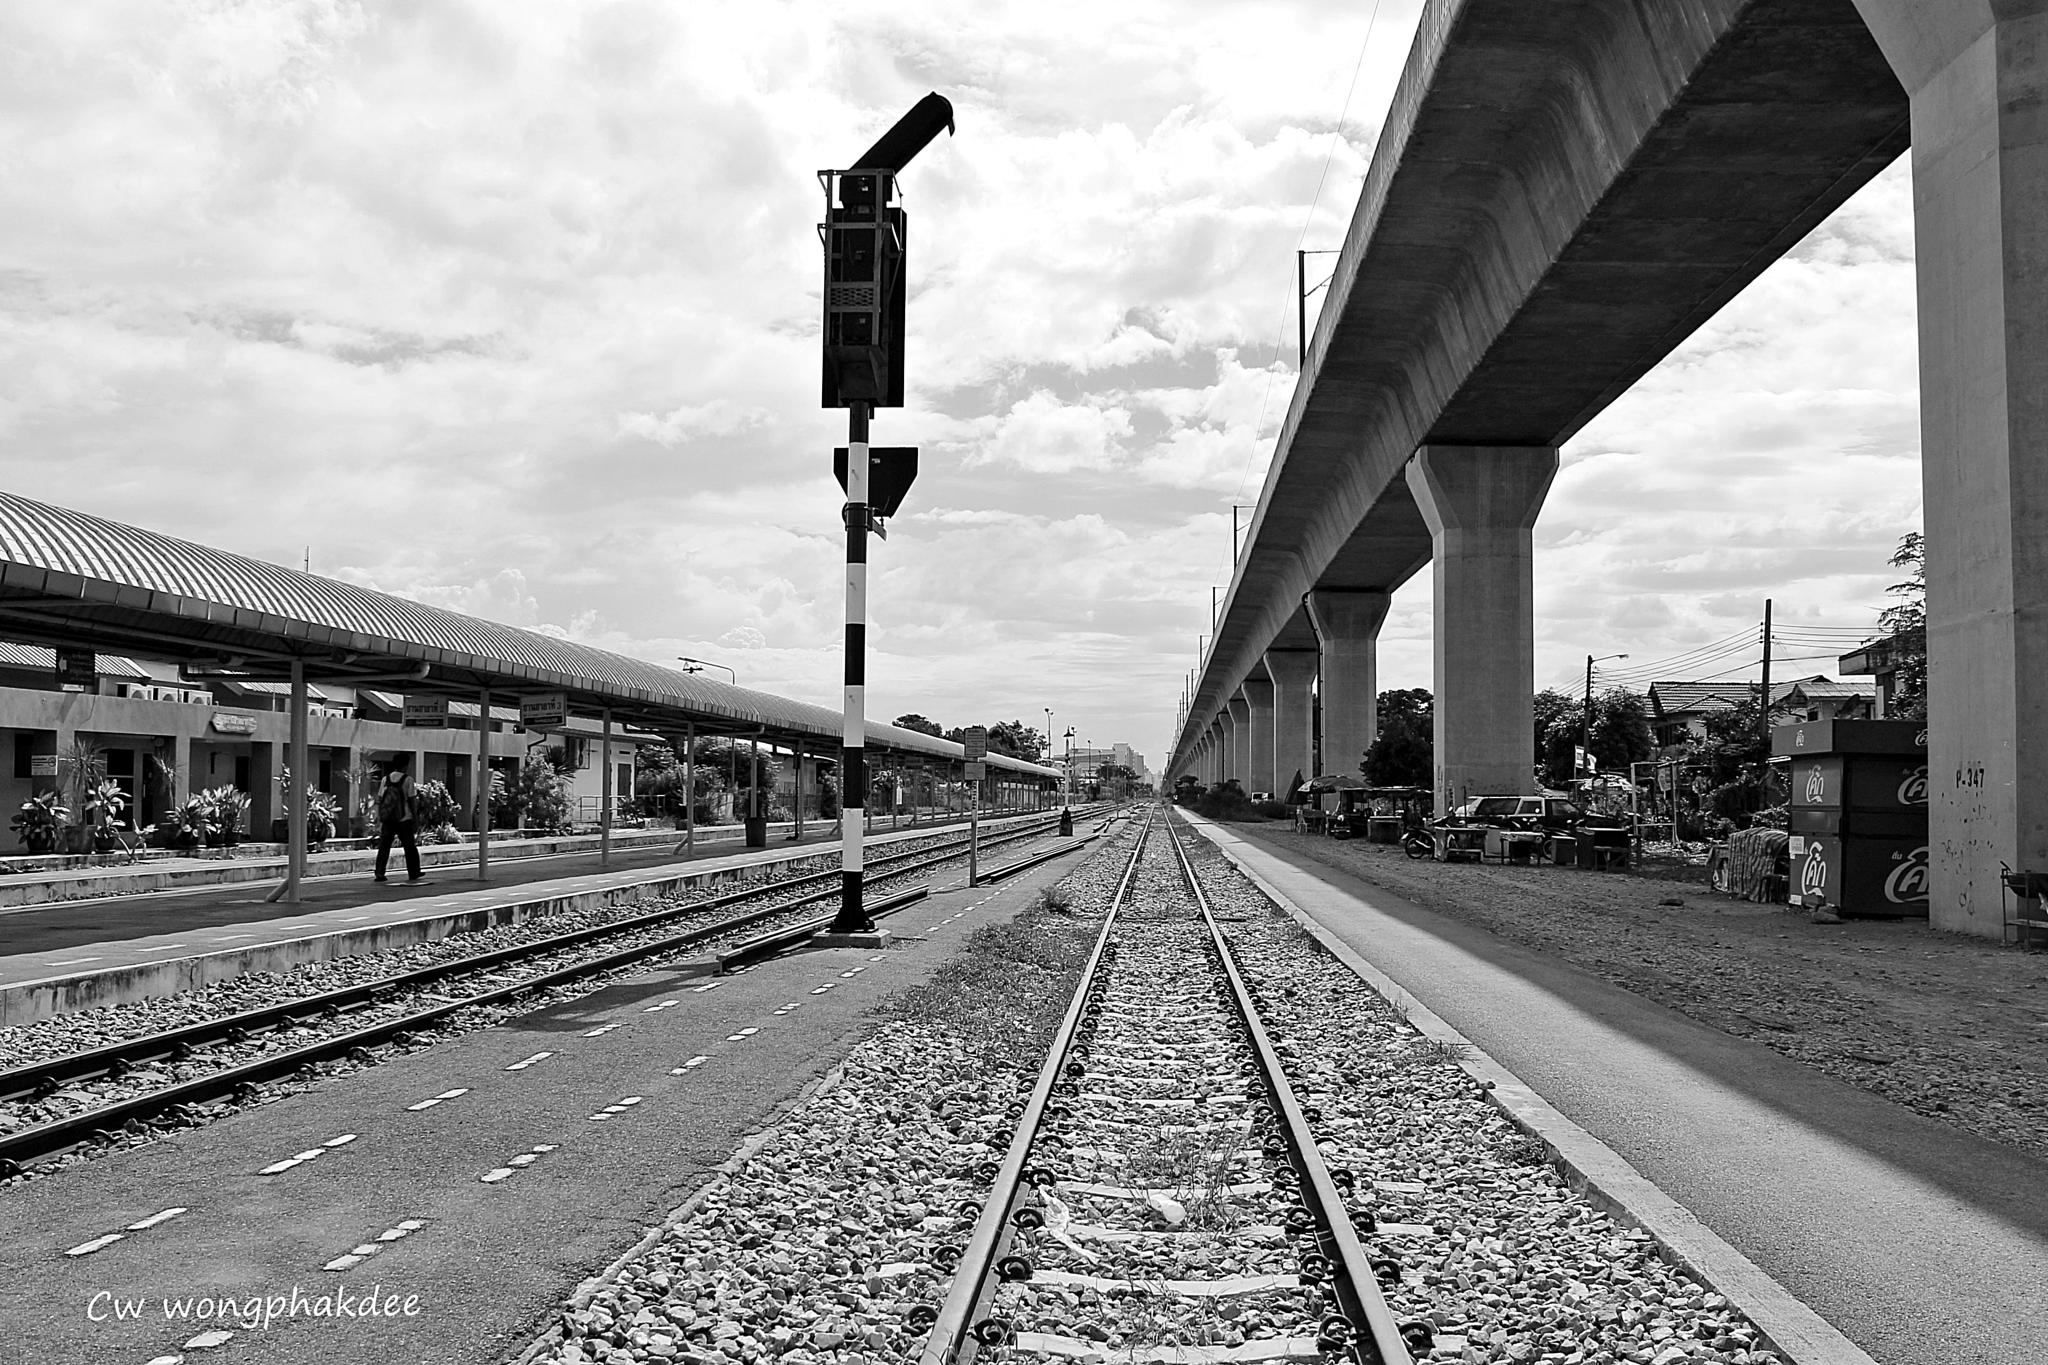 Railway by Wongphakdee